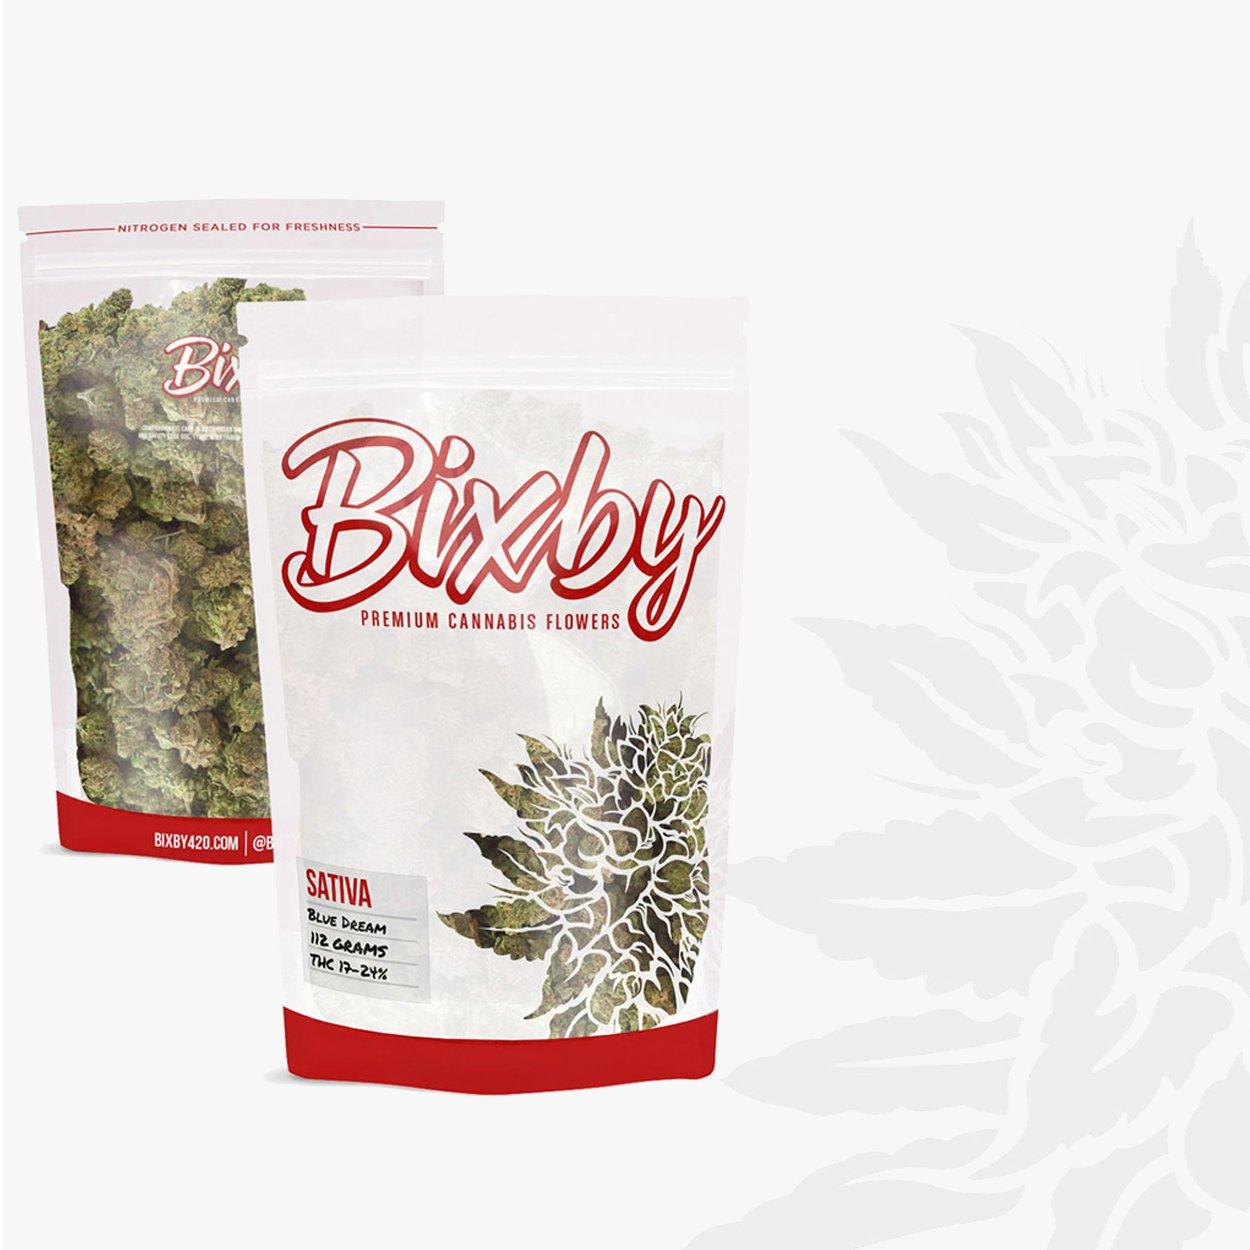 Bixby420-Branding-Mockup-2